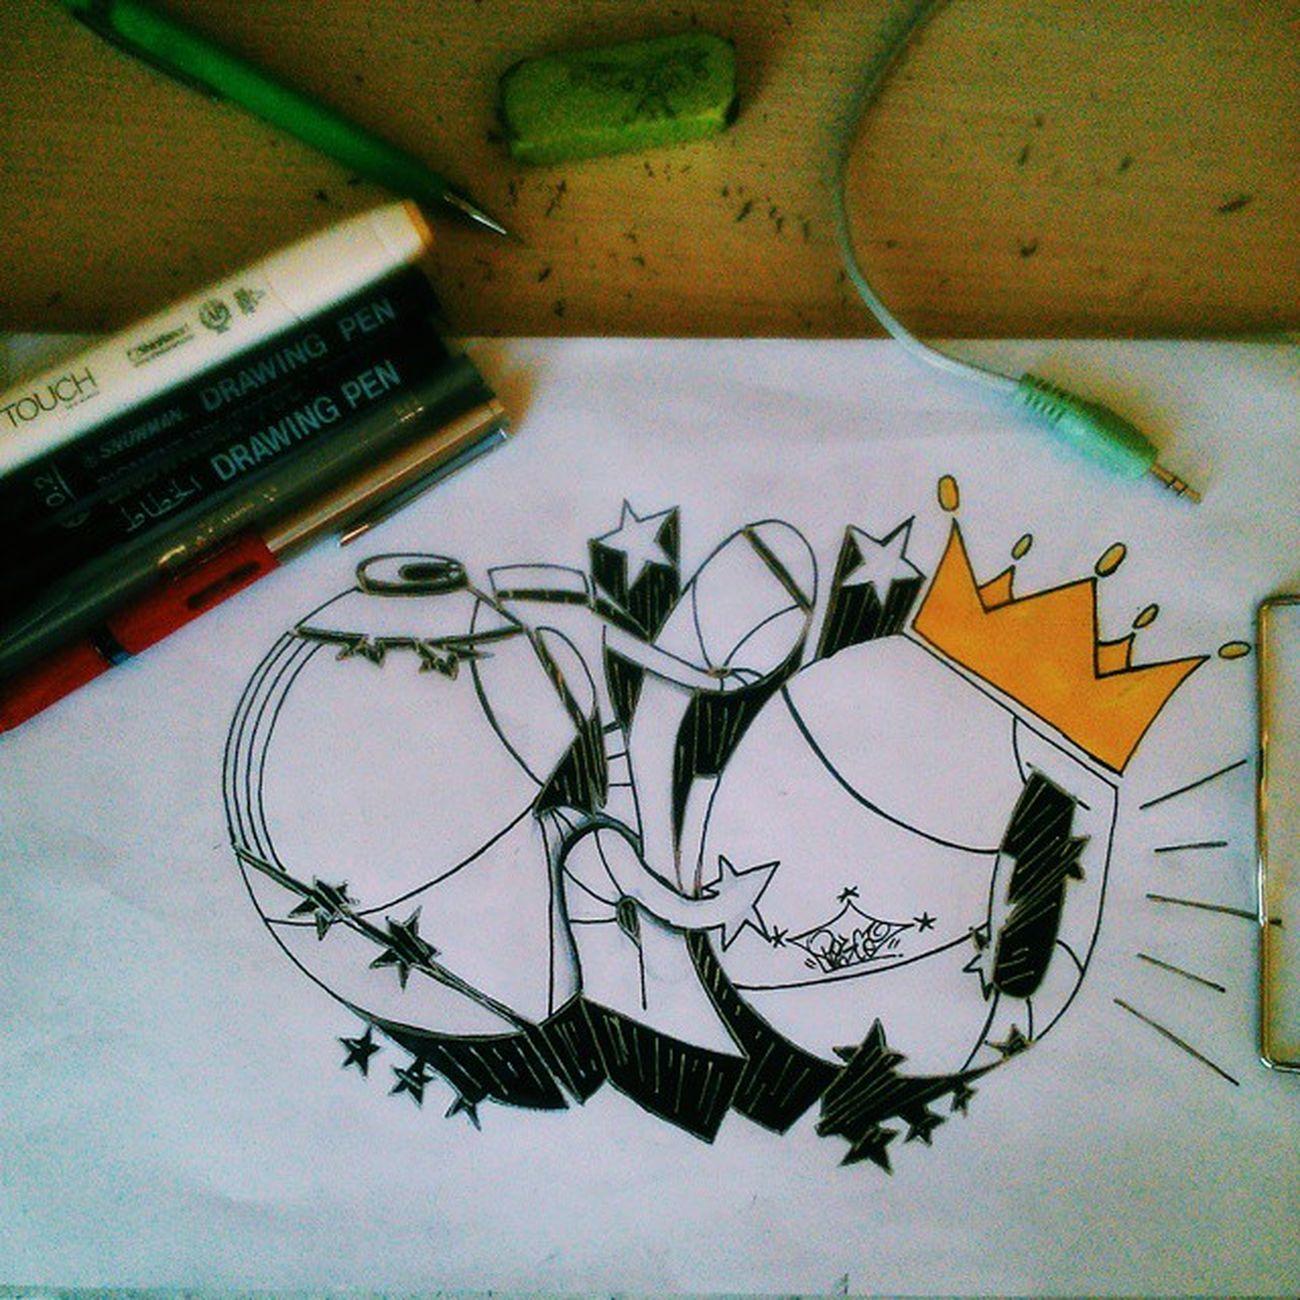 U . F . O . Good Graffitifont Graffiti Art Graff Graffiti Graffitiart Art_is_not_crime Art_is_not_a_crime Art_realistic Art Artist Arts_help Arts_gallery Art_spotlight Typo_graphy Typo Typography Things Tuch Tuch Yellow Blacknwhite Black Black_white Color coloring paper snowman music